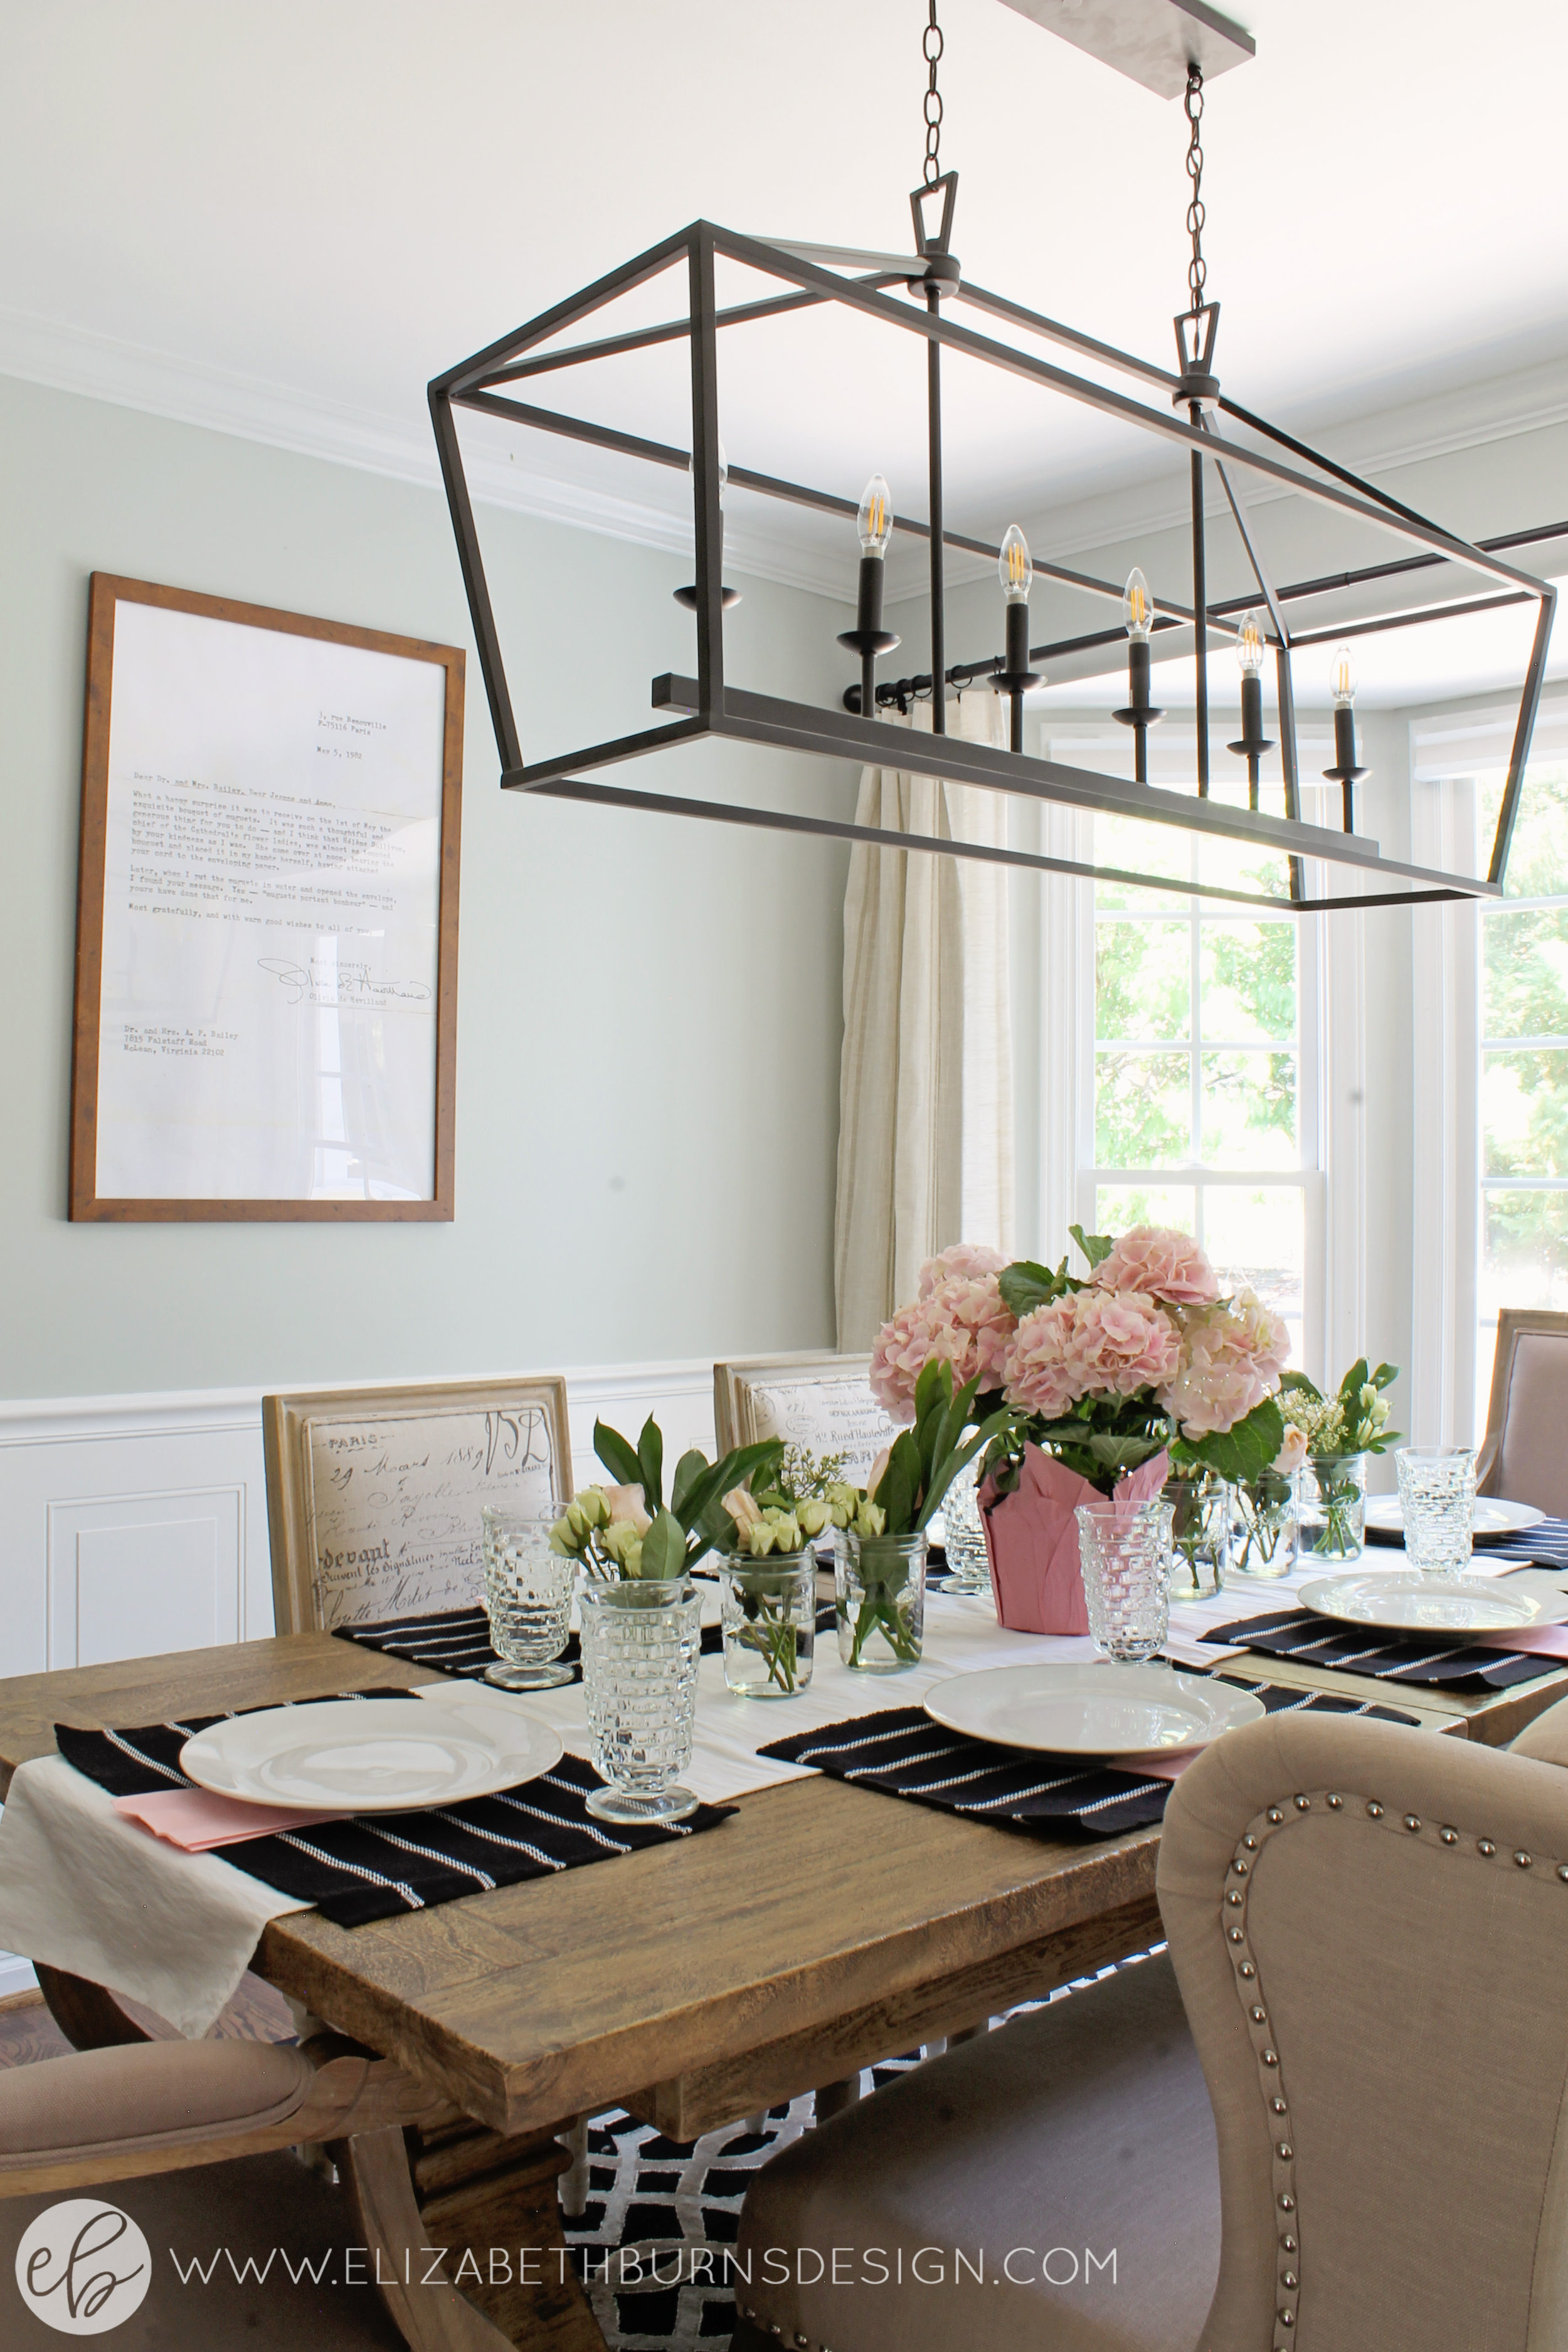 Elizabeth Burns Design - Budget Farmhouse Small Dining Room Sherwin Williams Silver Strand Trestle Table Linen Chairs DIY Wainscoting Dark Walnut Oak Floor (5).jpg